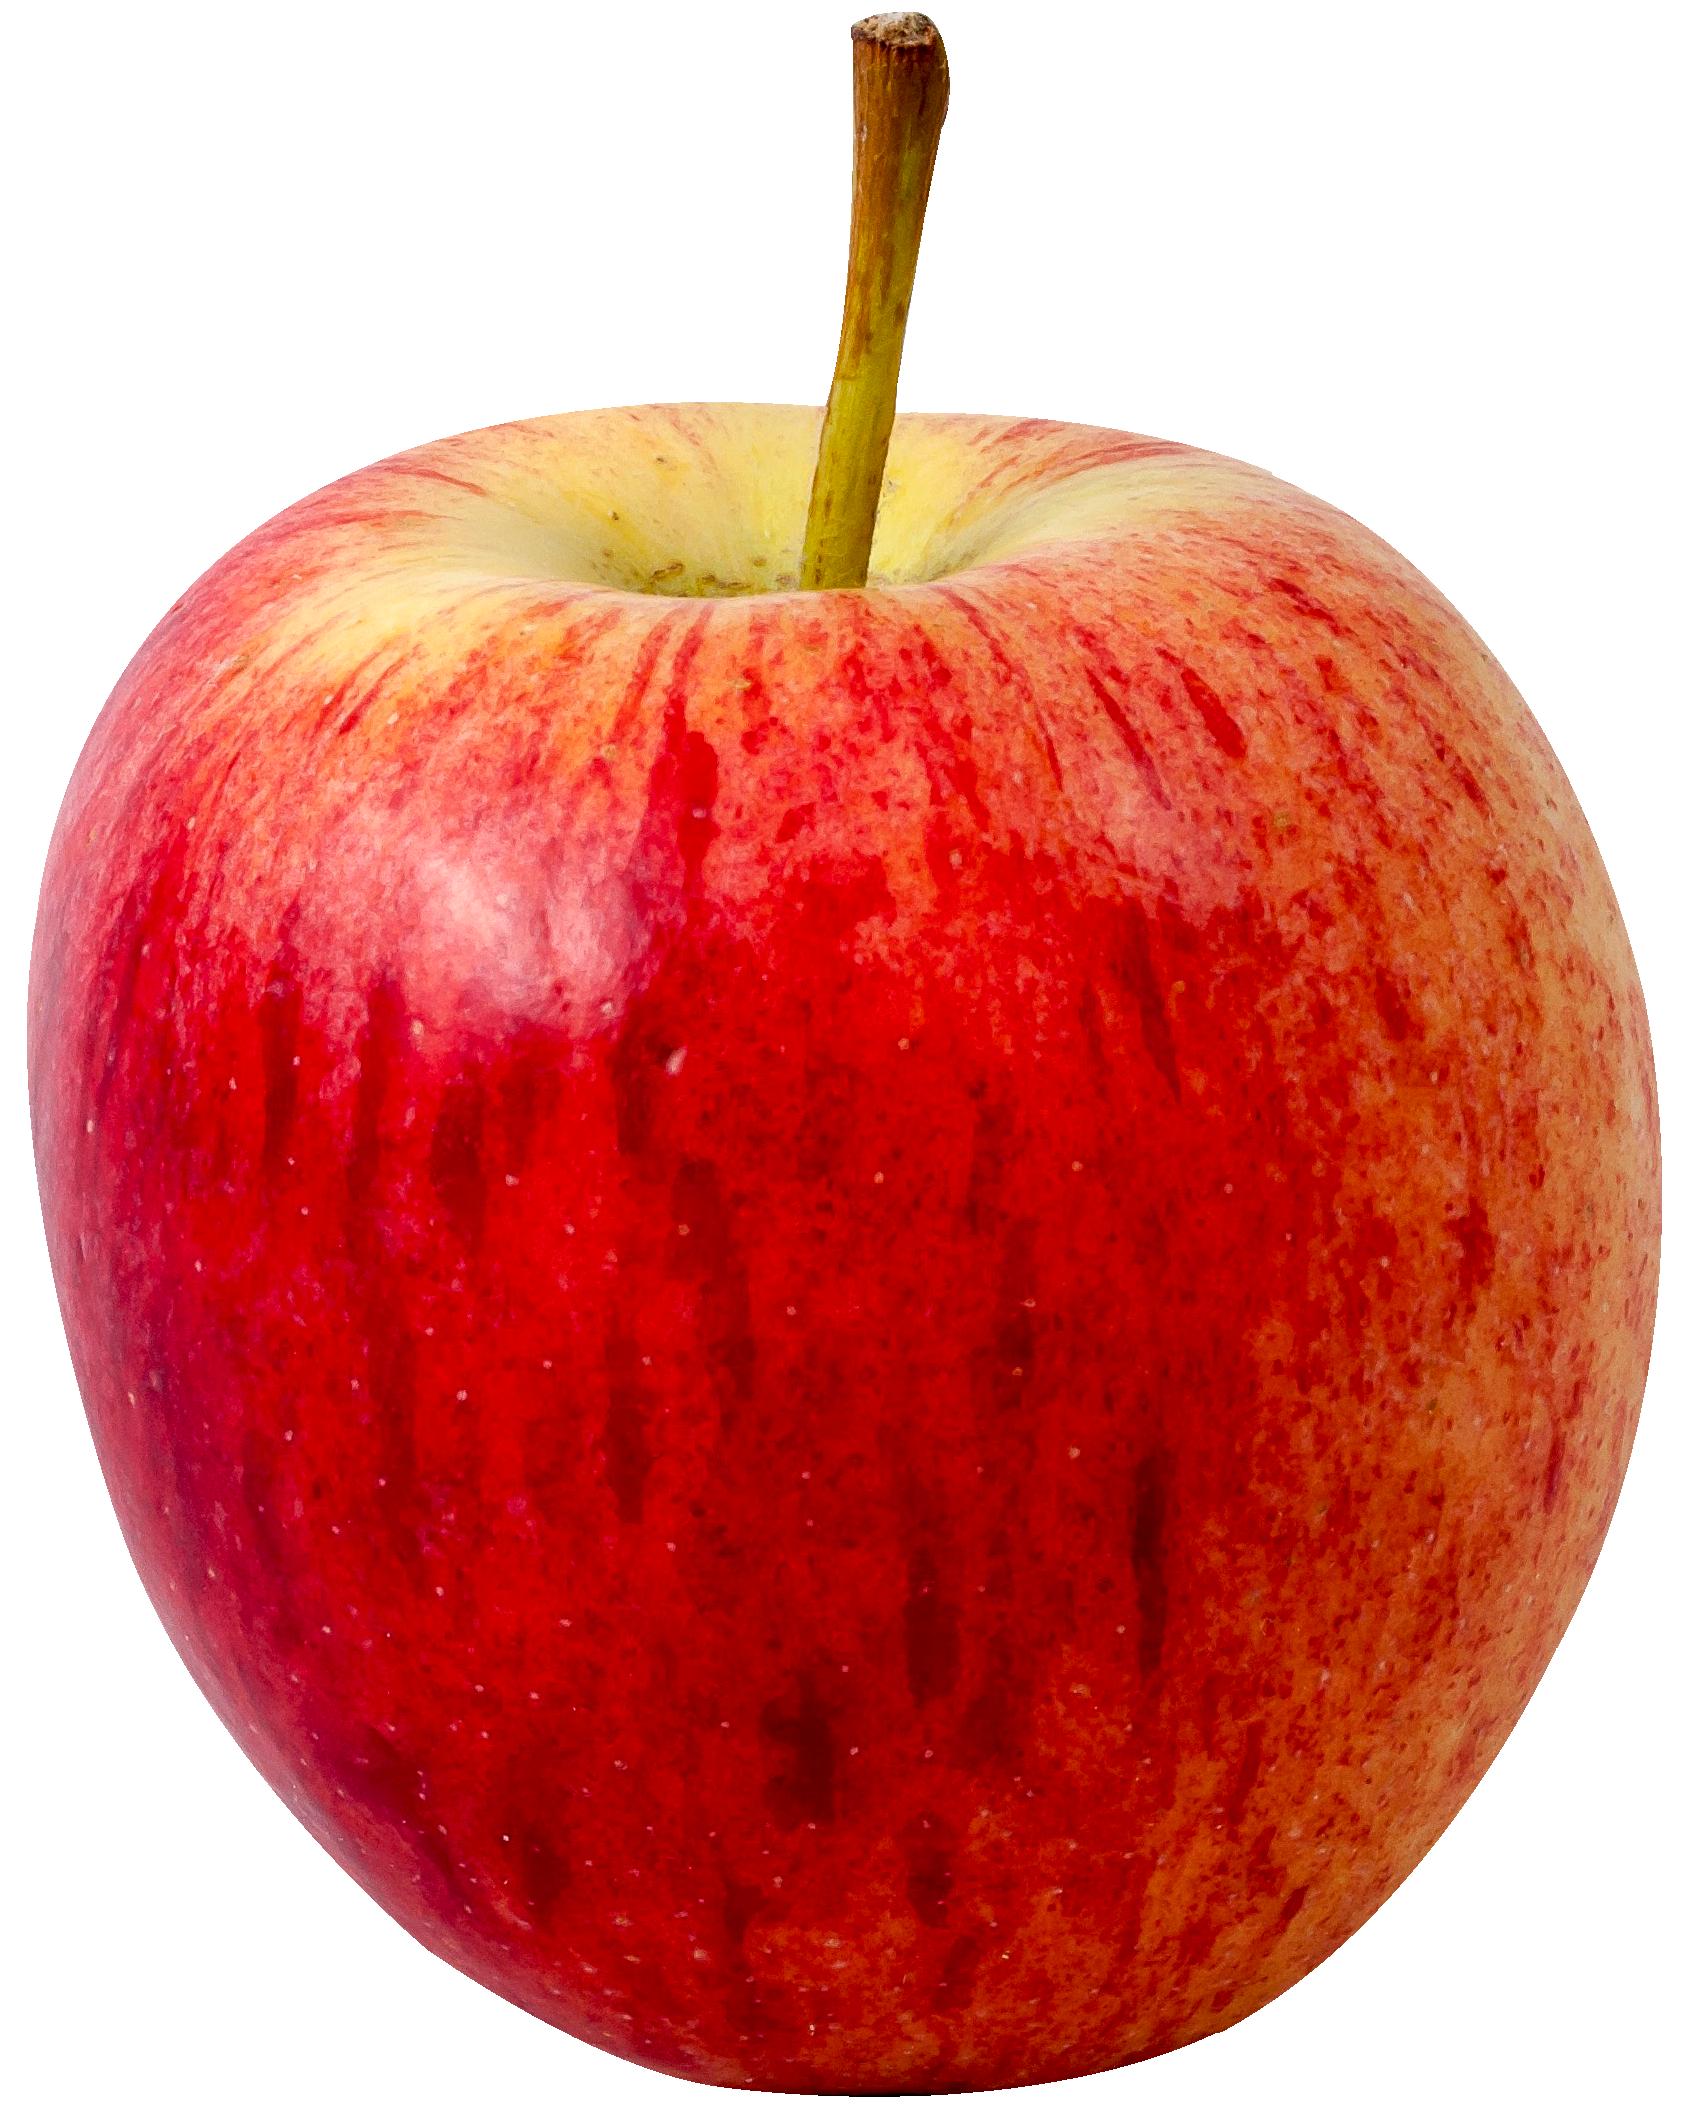 Image result for download hd transparent images of fruits